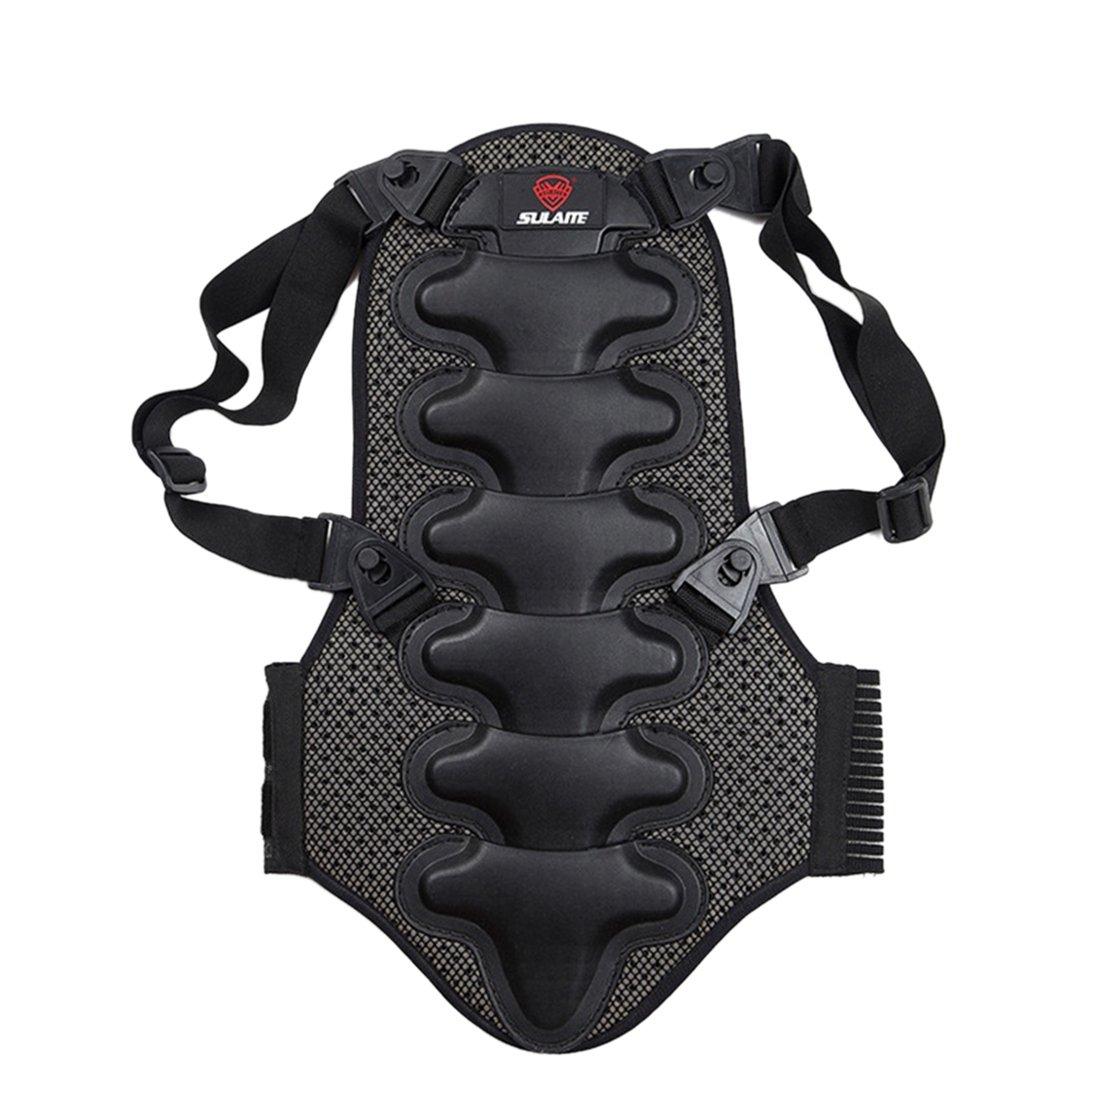 Yuehua Motorcycle Protective Armor Asian Size S